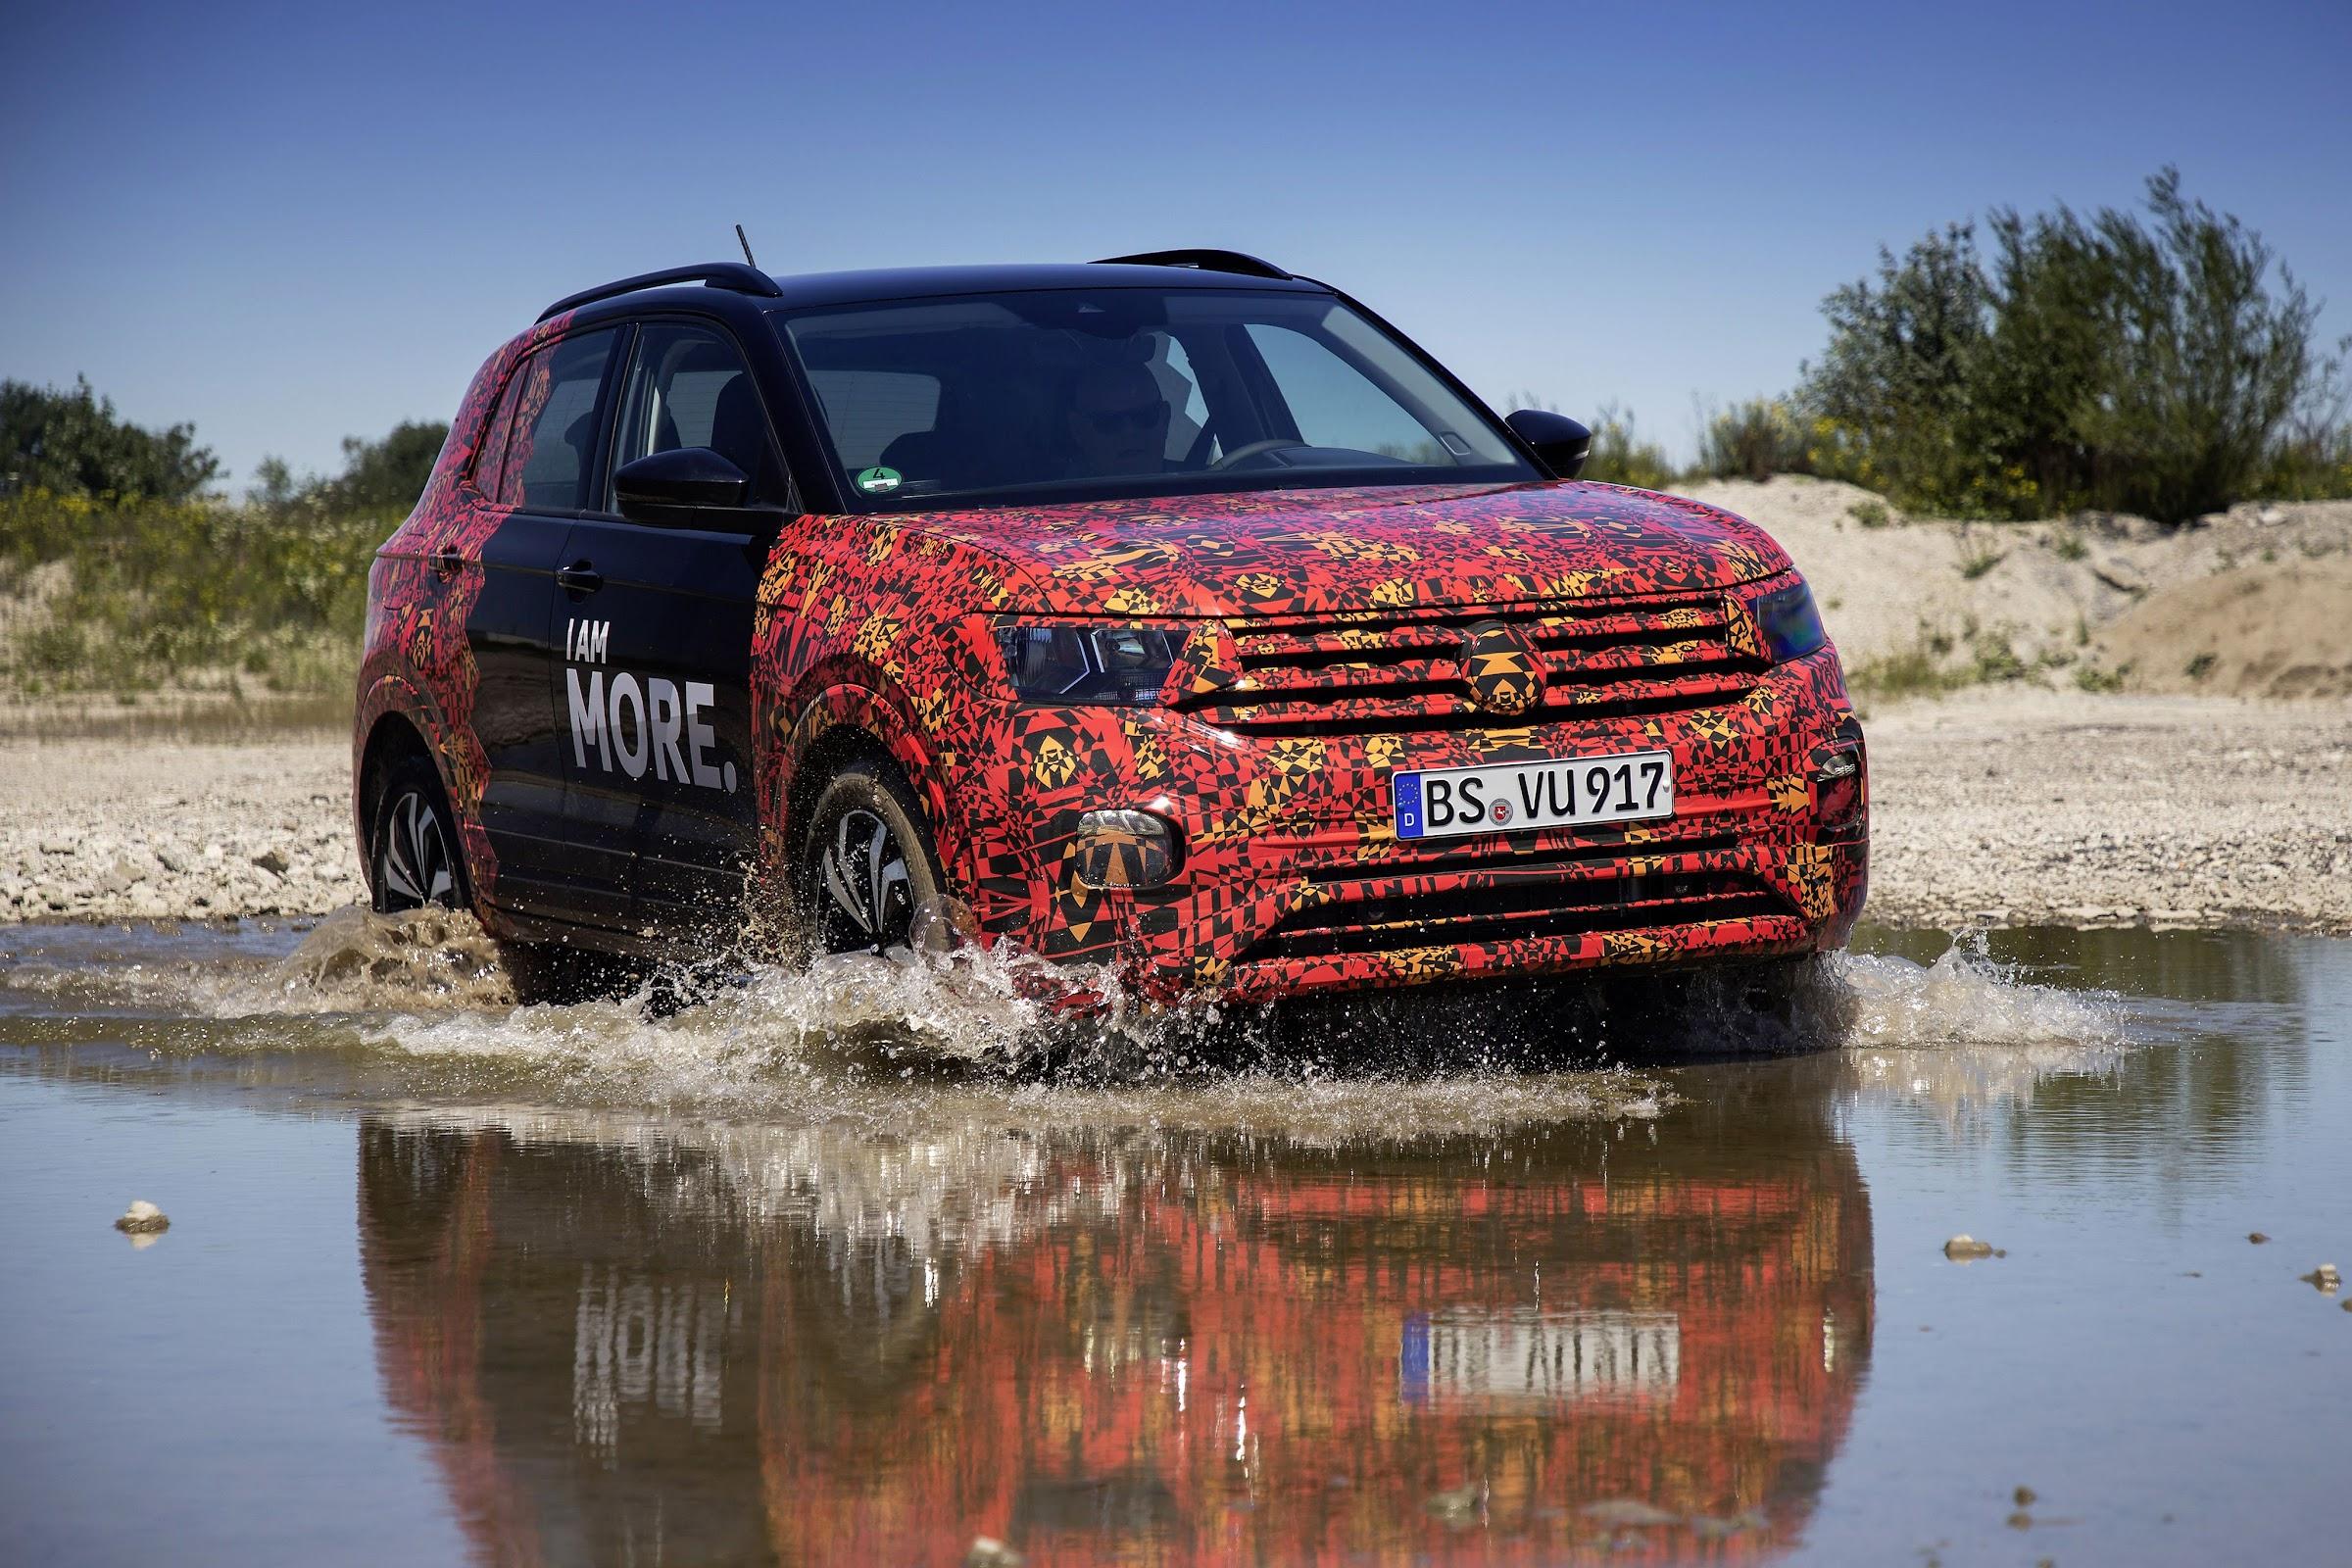 0y6C KIp0Sv53RXYlCQAJB4fQFA57xDdvTU3IQ7W0Gvre6dnOIACi9QgYioXlV9NxEpr9FCqBkG74UqFLagTOeM0C7BtgirGisJns2cVxbywgGHzgJH VM1mwPs3Wu1FOdkcErdtRw=w2400 - T-Cross: el SUV compacto de Volkswagen